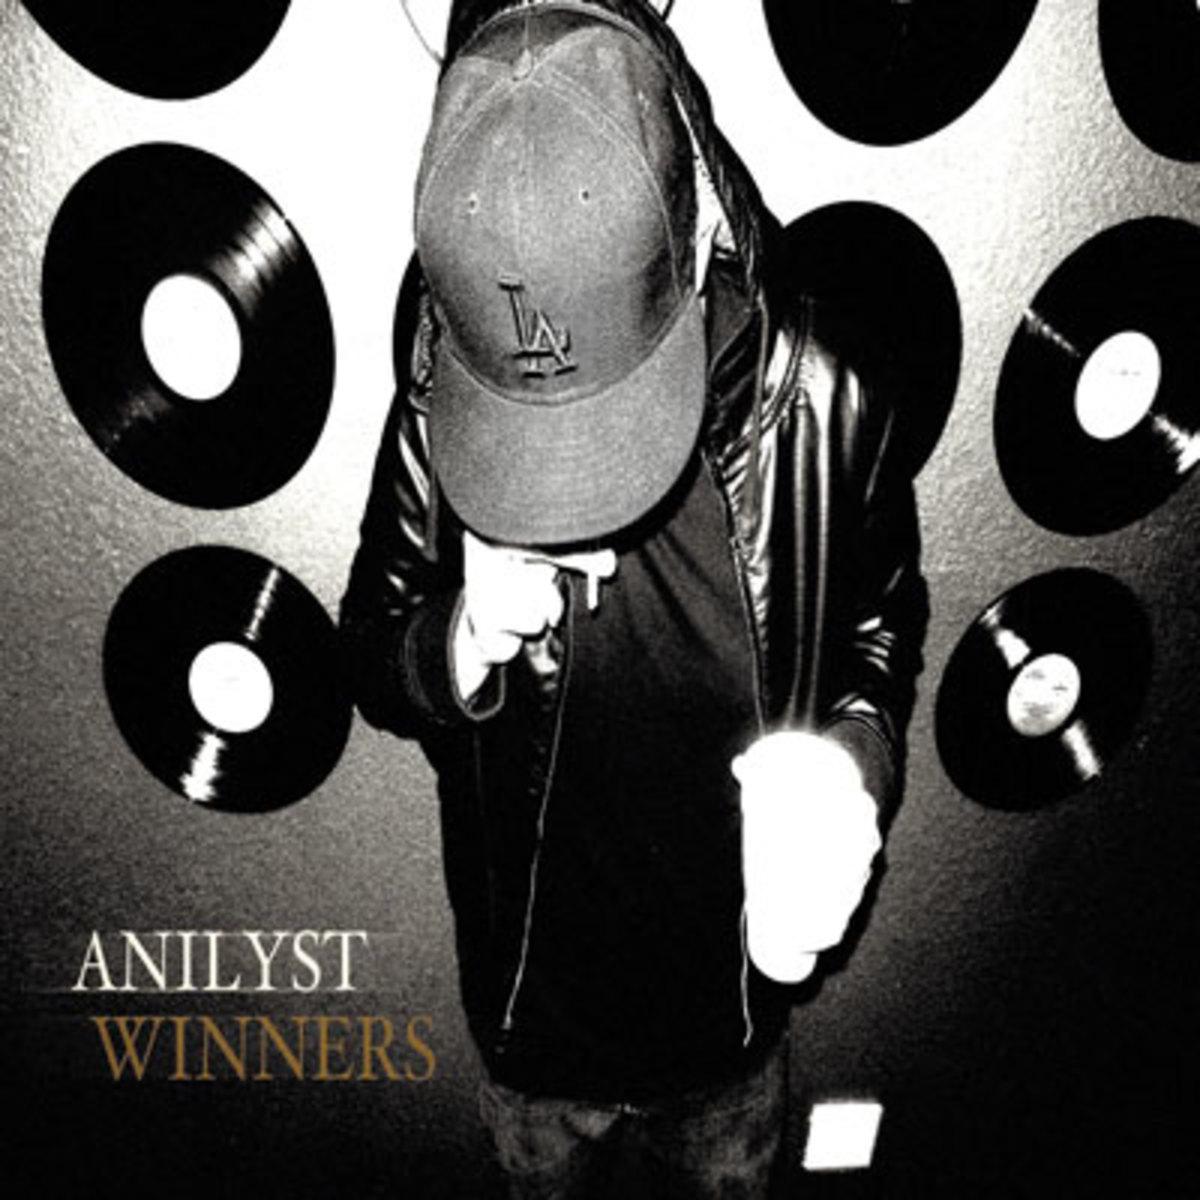 anilyst-winners.jpg